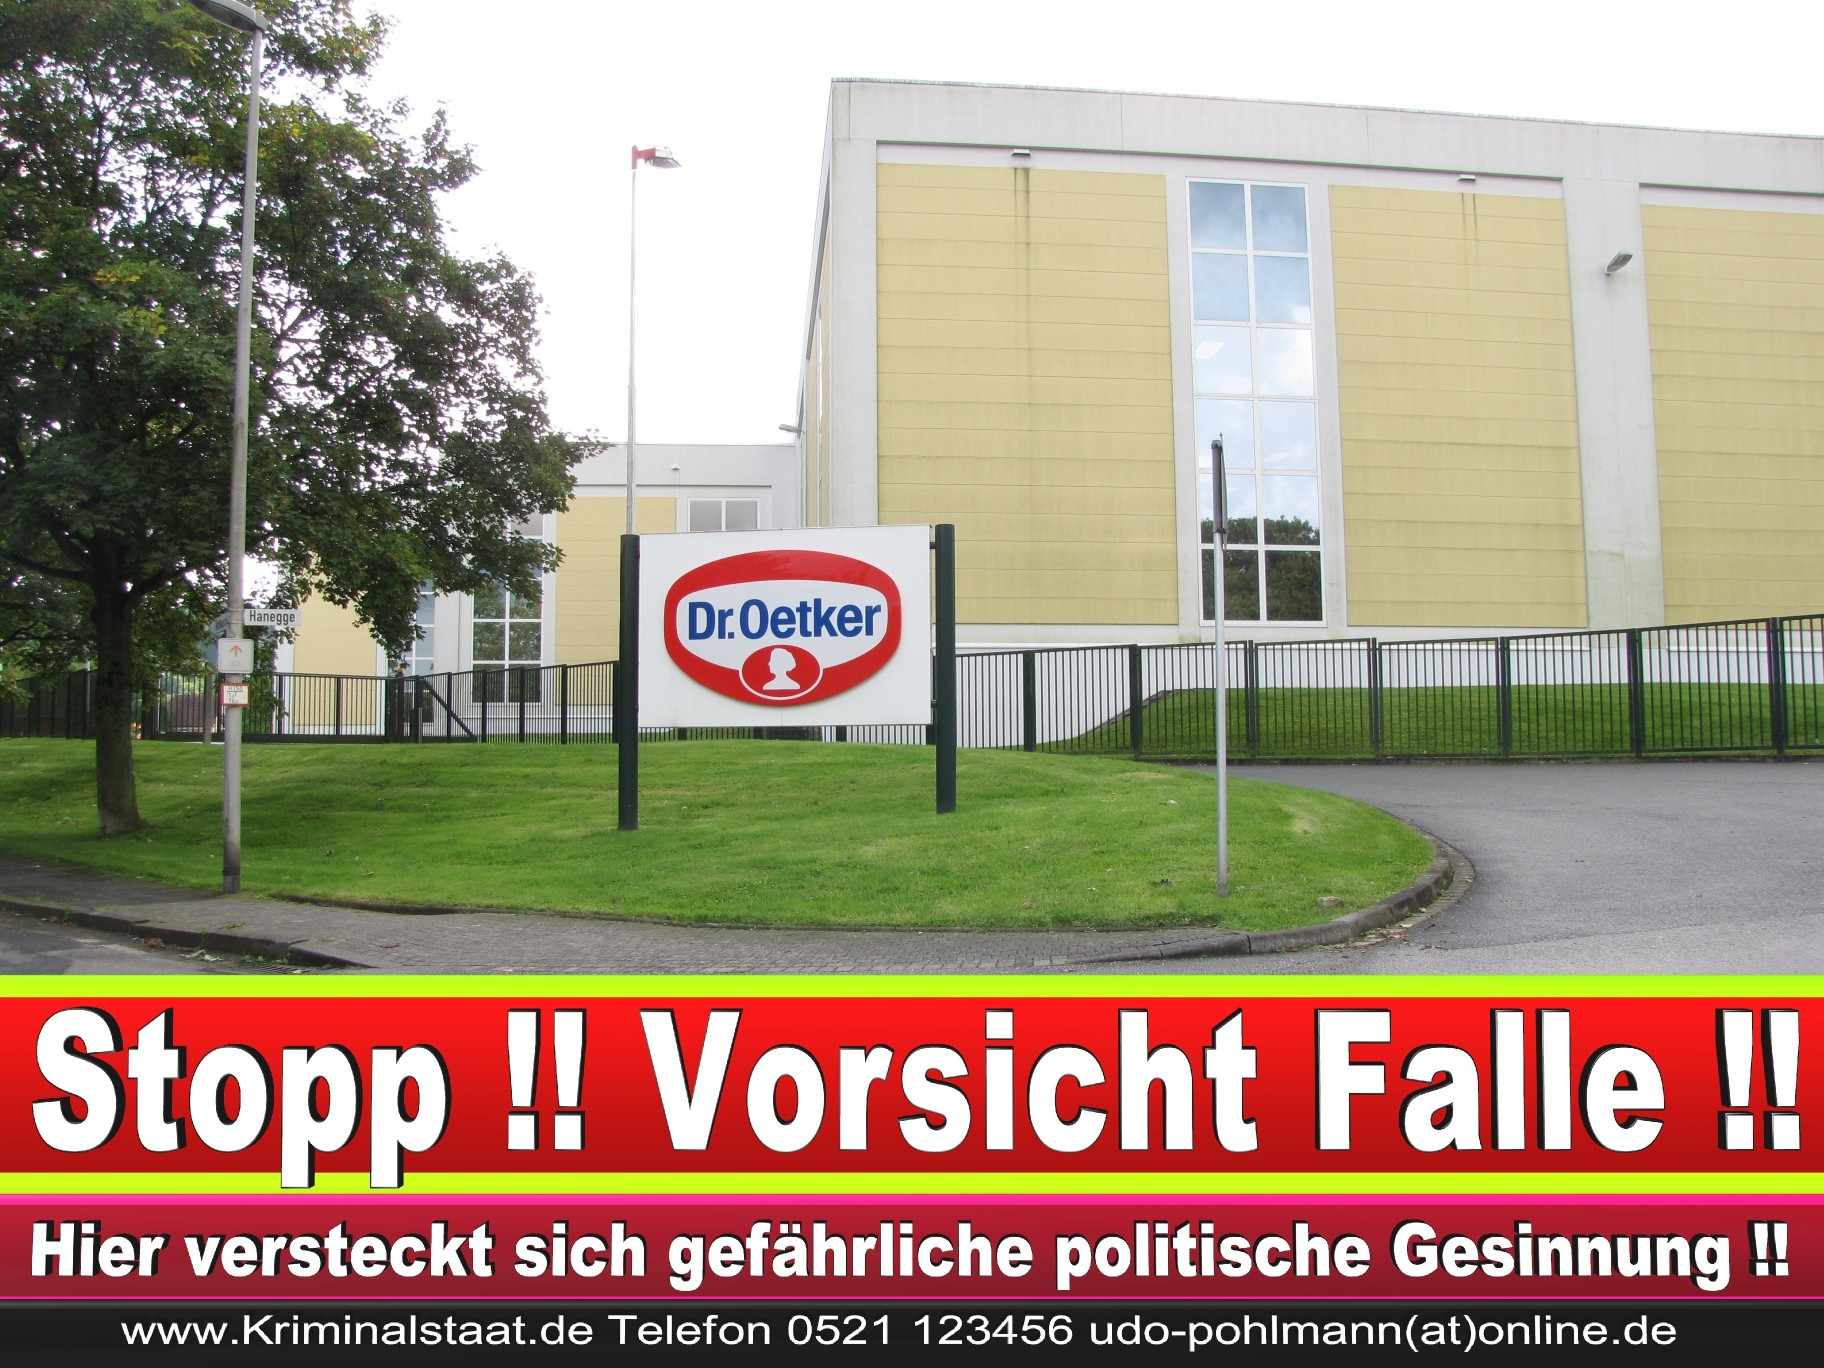 Dr Oetker Bielefeld CDU Bielefeld Spendengelder Skandal Richard August 39